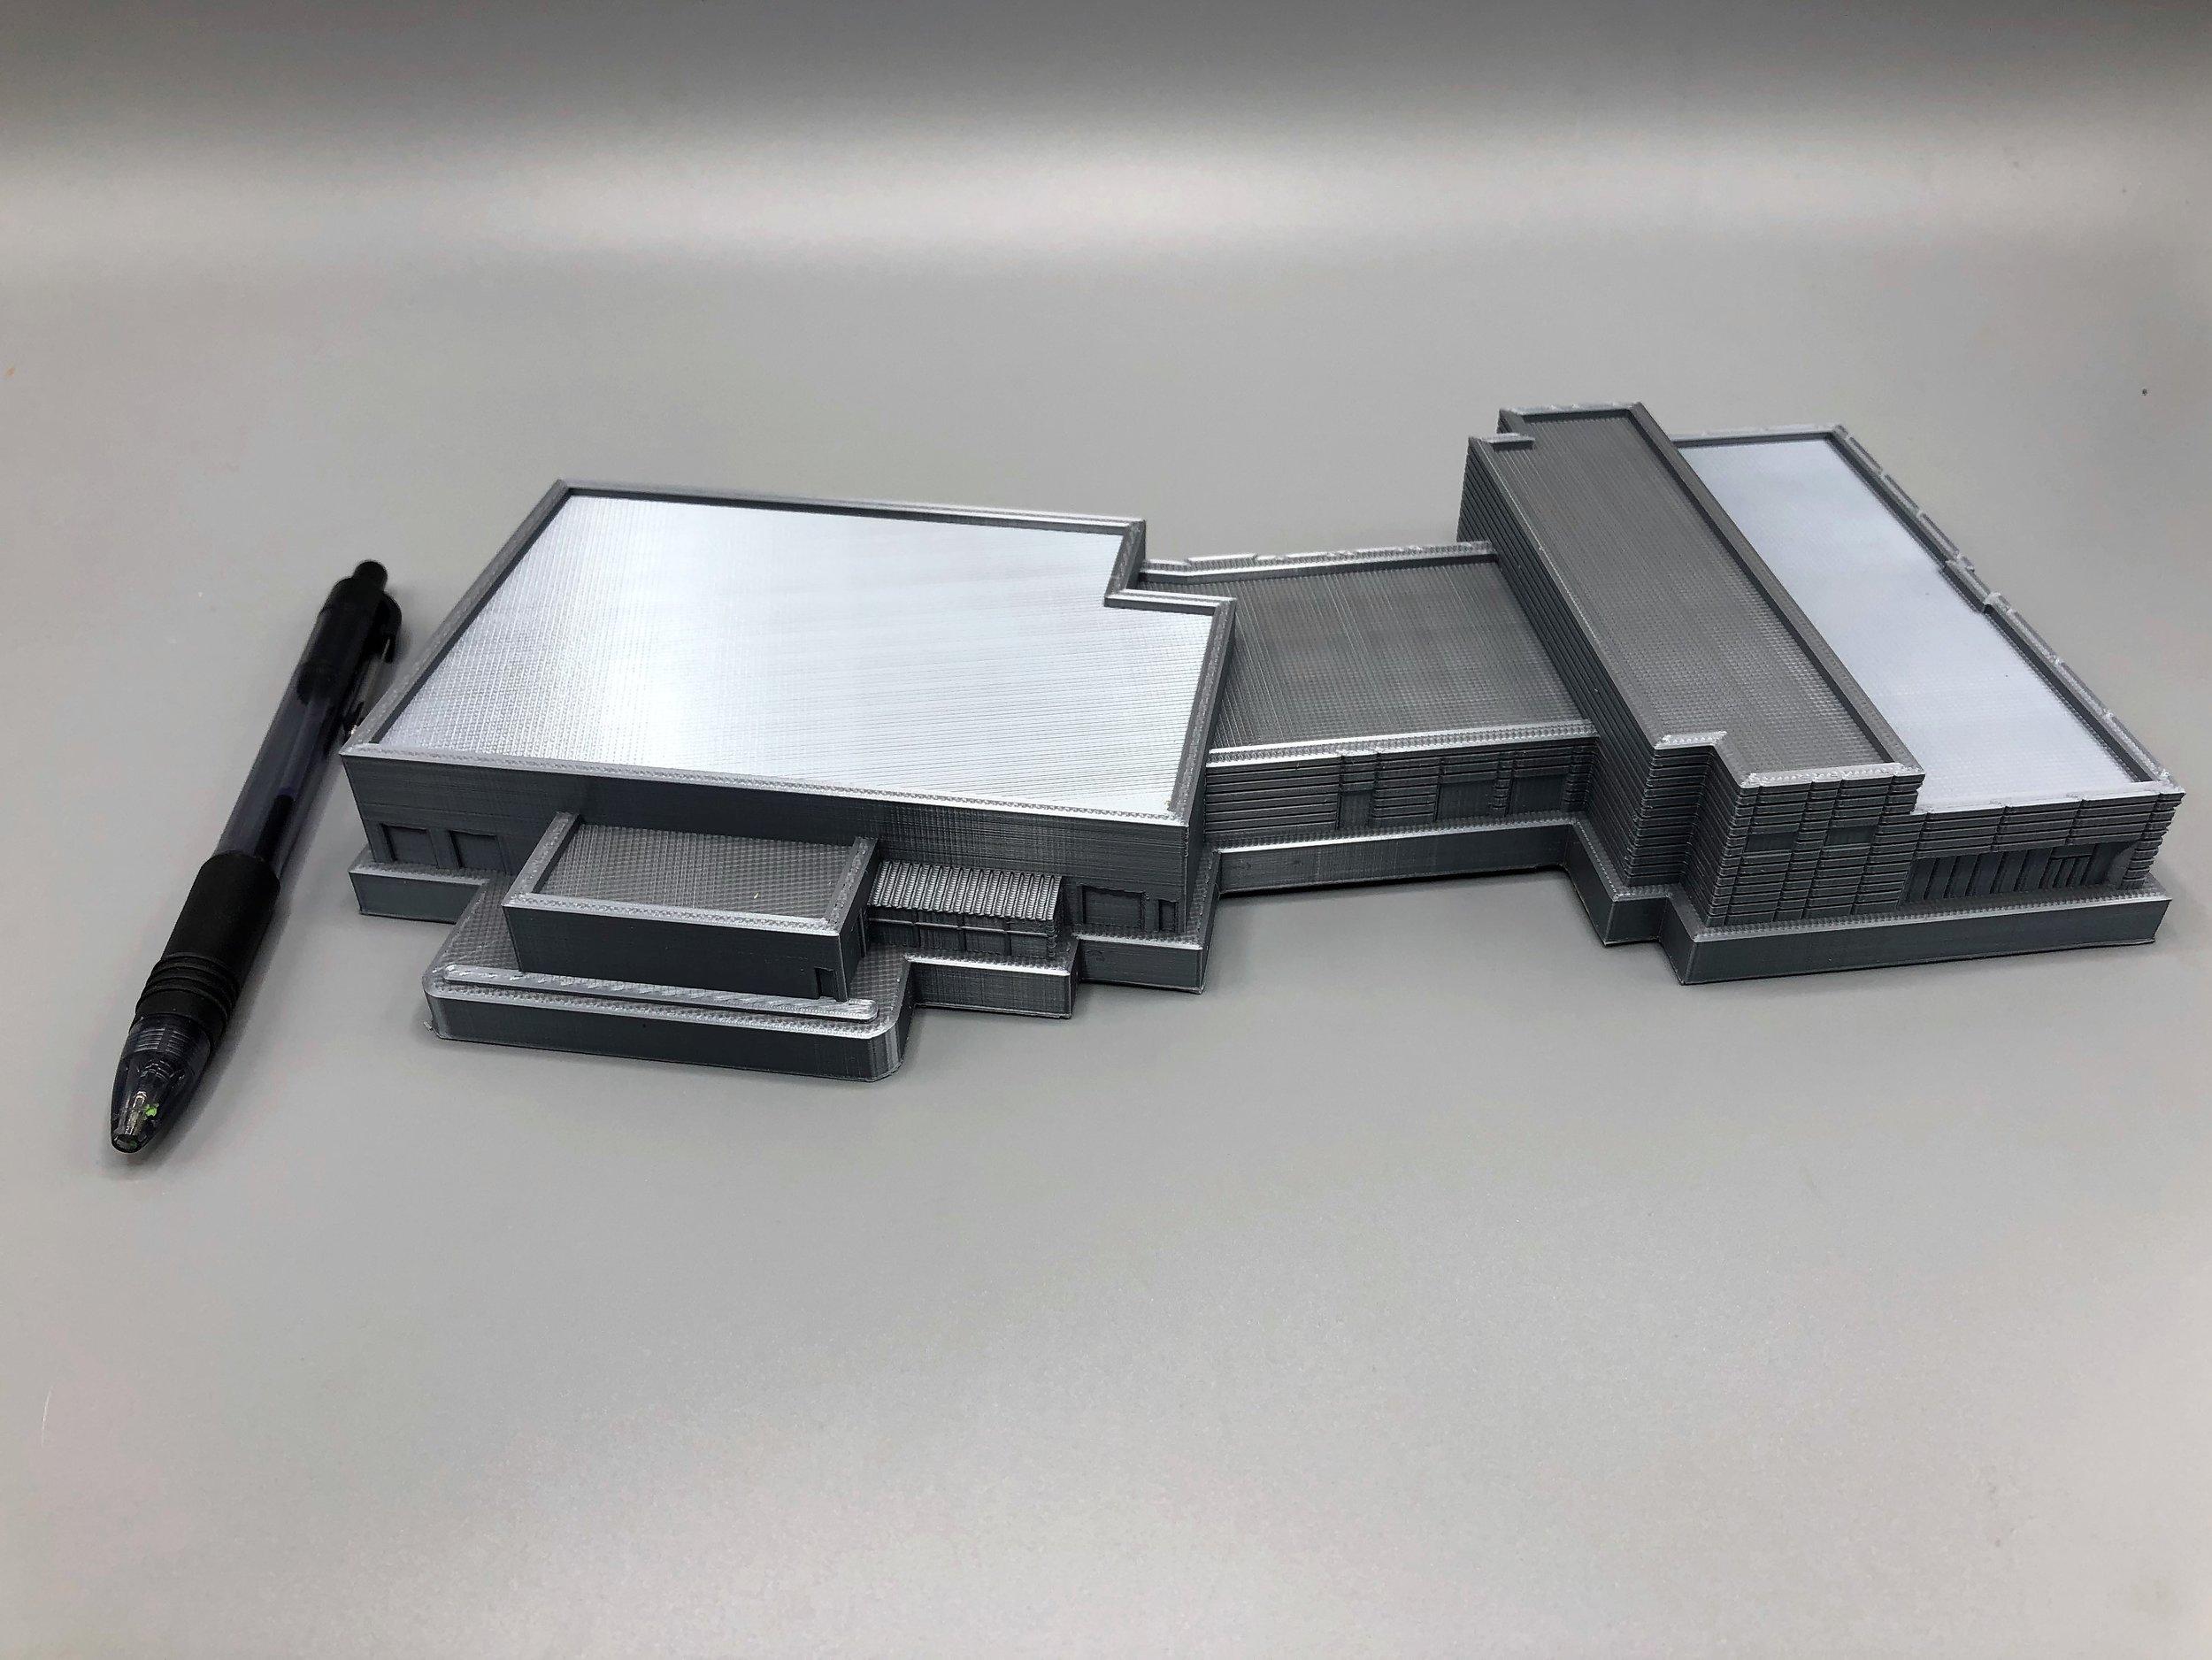 "Car Dealership Scale Model - 12"", PLA, 100 micron"